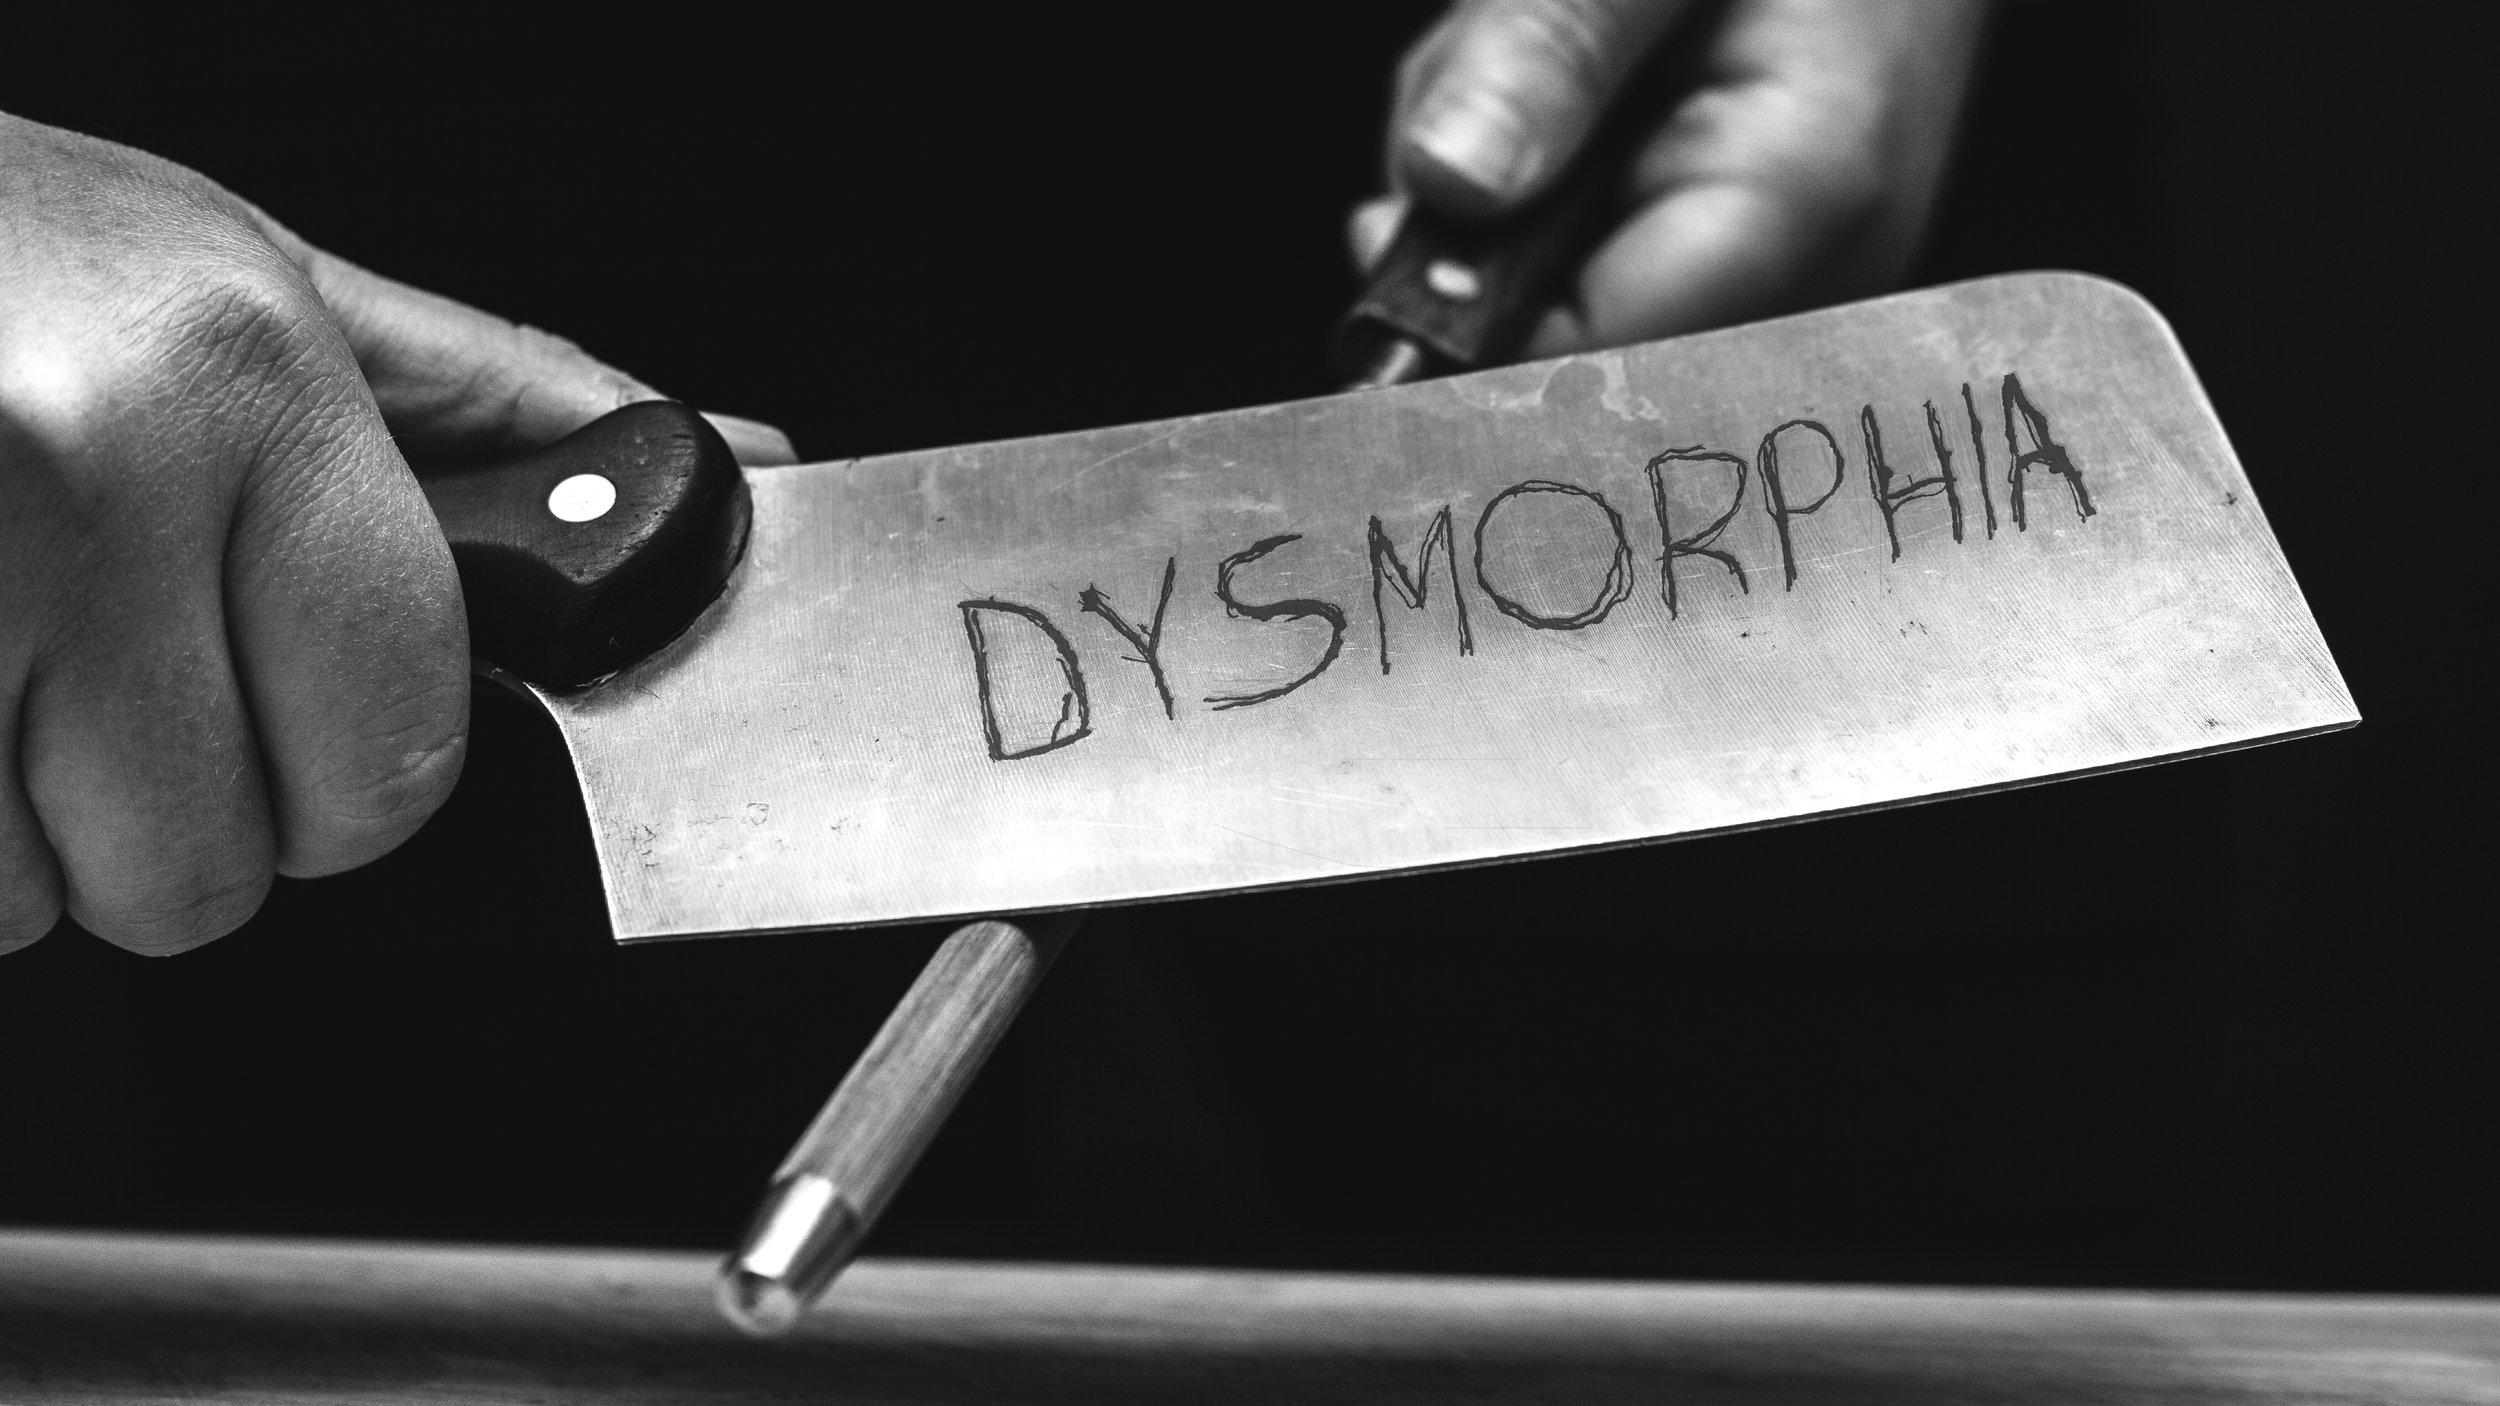 DYSMORPHIA knife.jpg